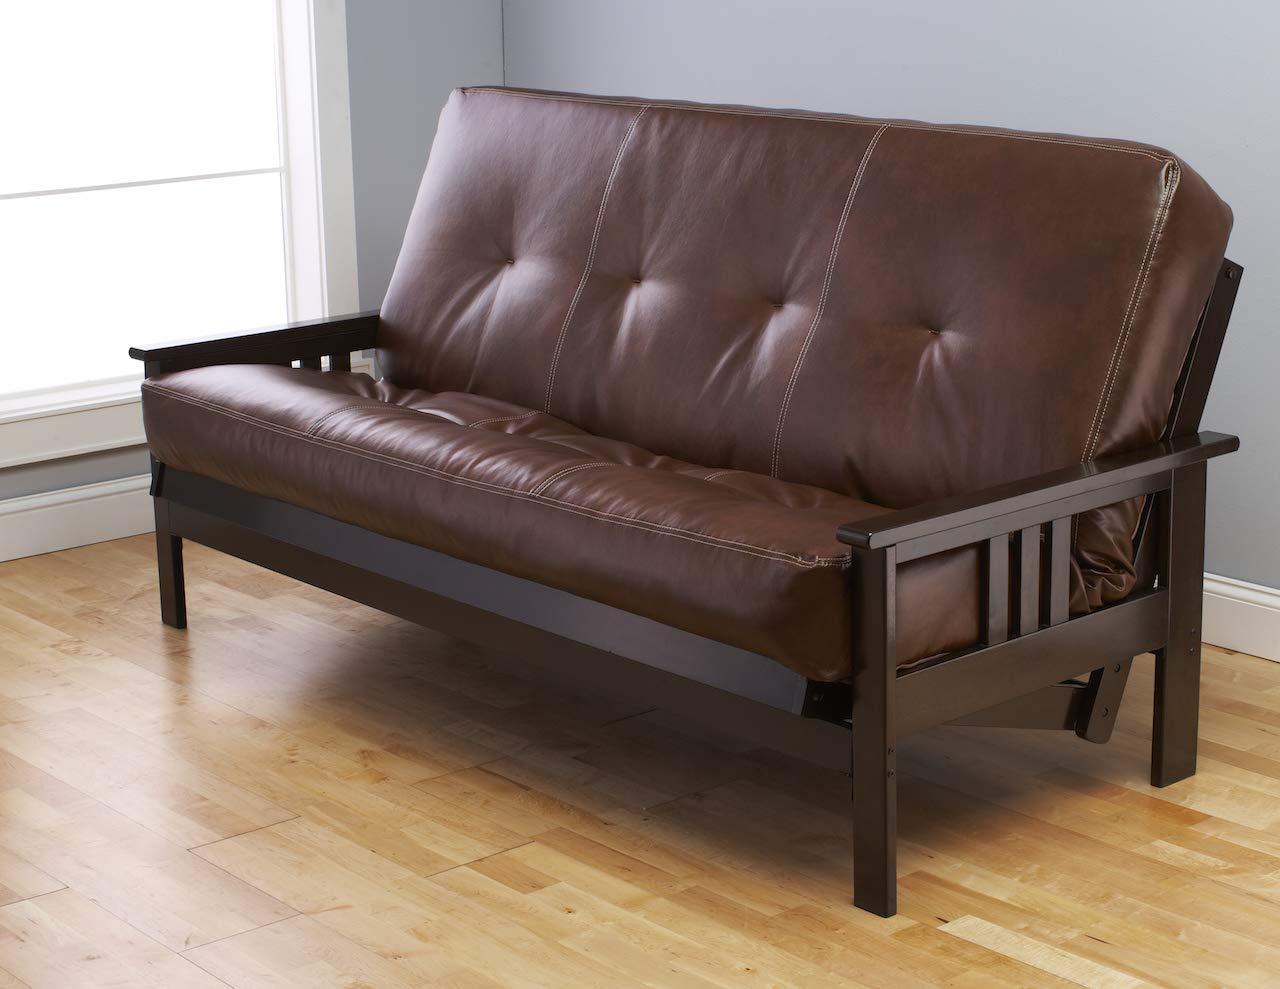 Kodiak Montreal X Espresso Futon Frame w/Quality 8 Inch Innerspring Mattress Sofa Bed Set Full Size (Havana Leather Matt and Frame Only) by Kodiak